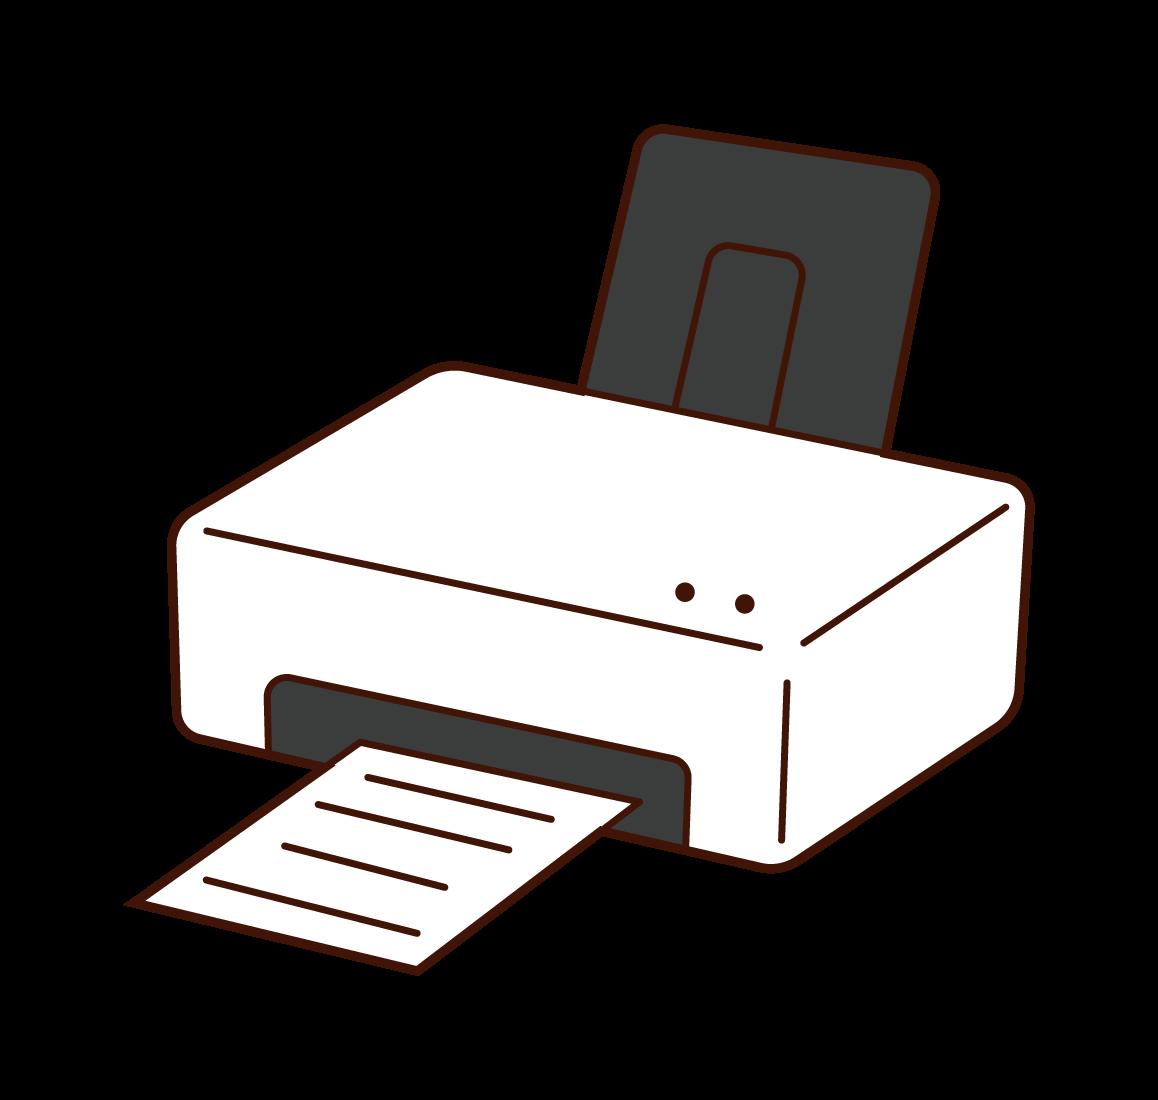 Illustration of a home printer